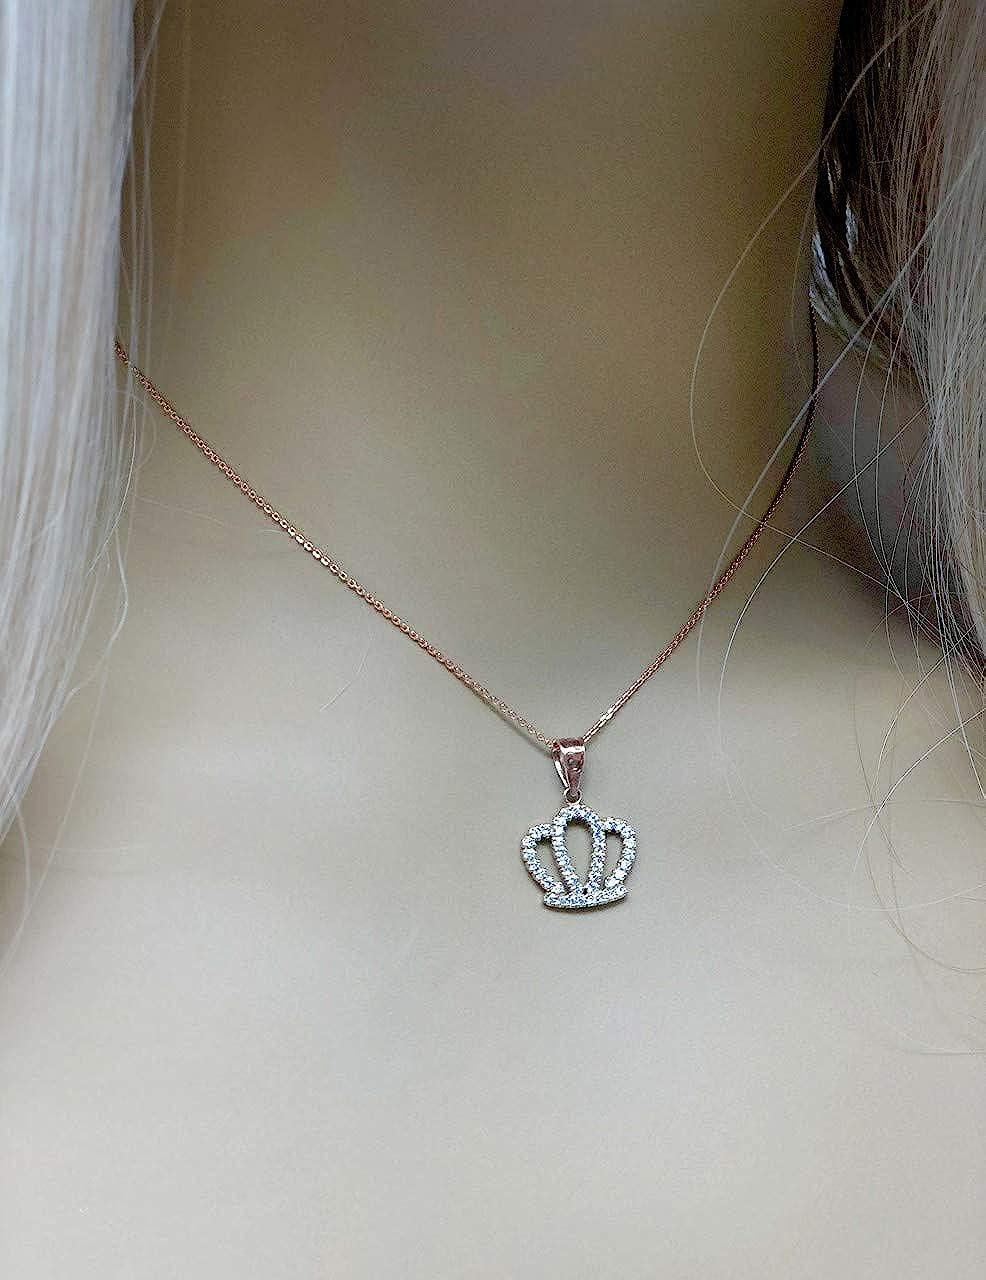 Exquisite 14k Rose Gold Radiant Diamond Royal Crown Pendant Necklace